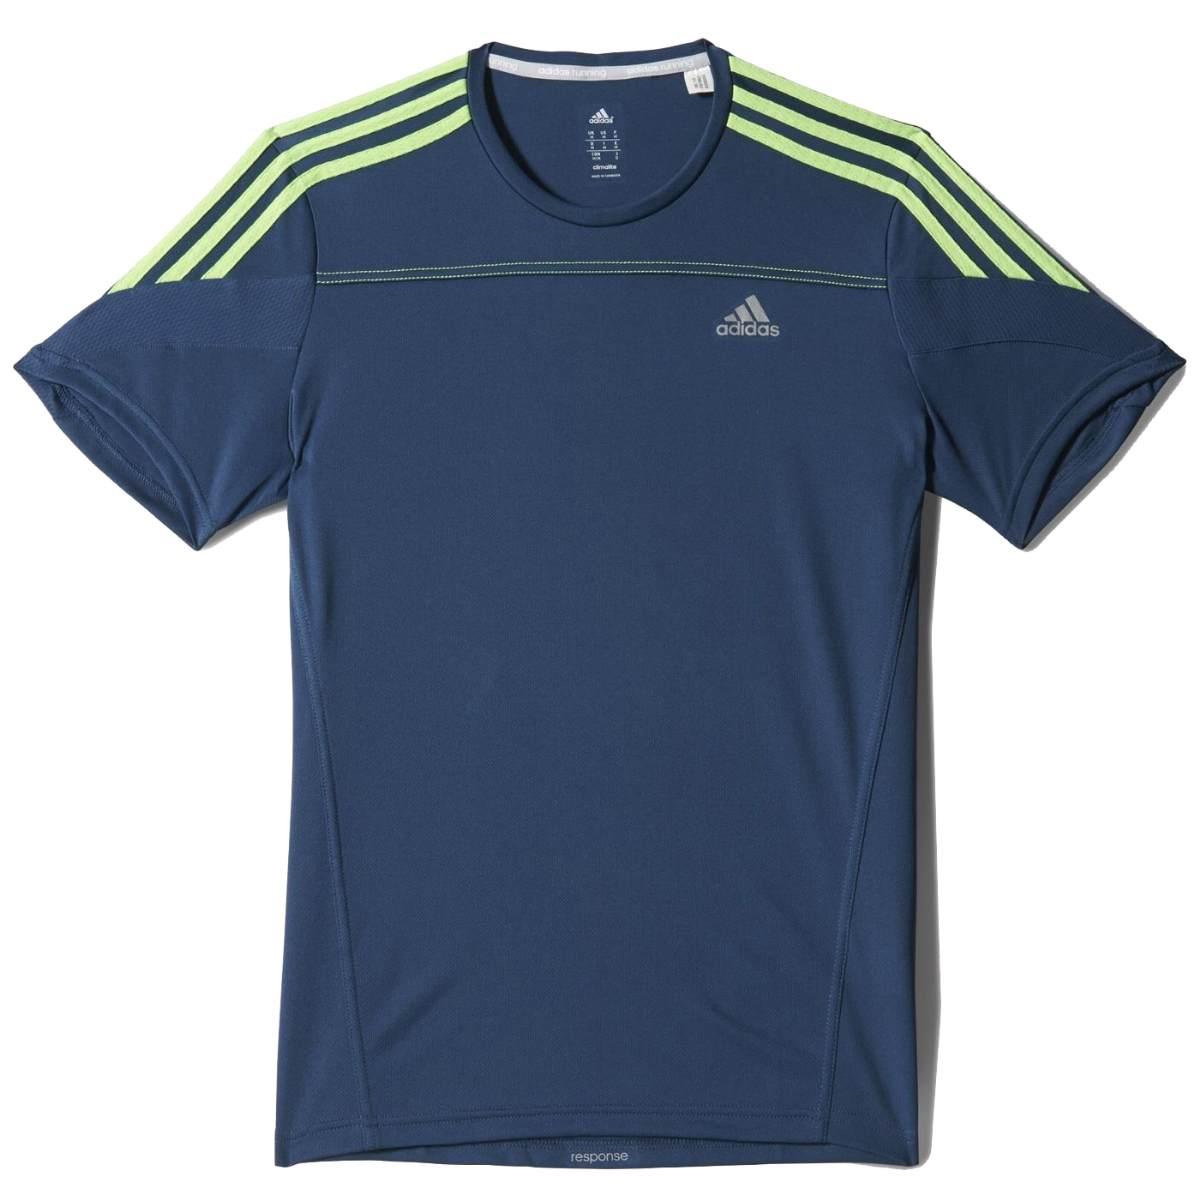 adidas response t shirt running shirt men various colours. Black Bedroom Furniture Sets. Home Design Ideas